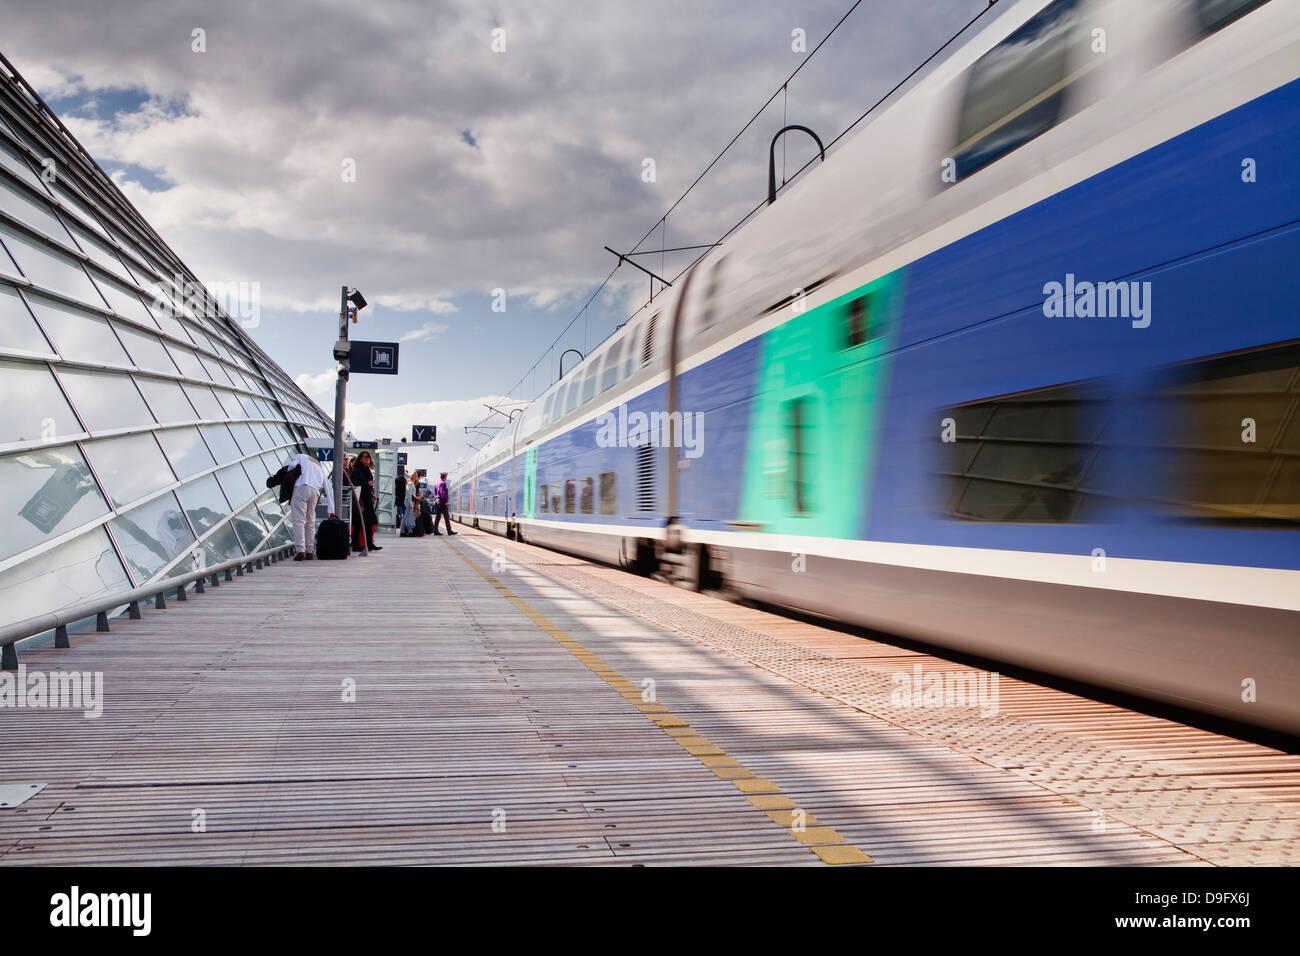 A TGV pulls into the train station of Avignon TGV, Vaucluse, France - Stock Image